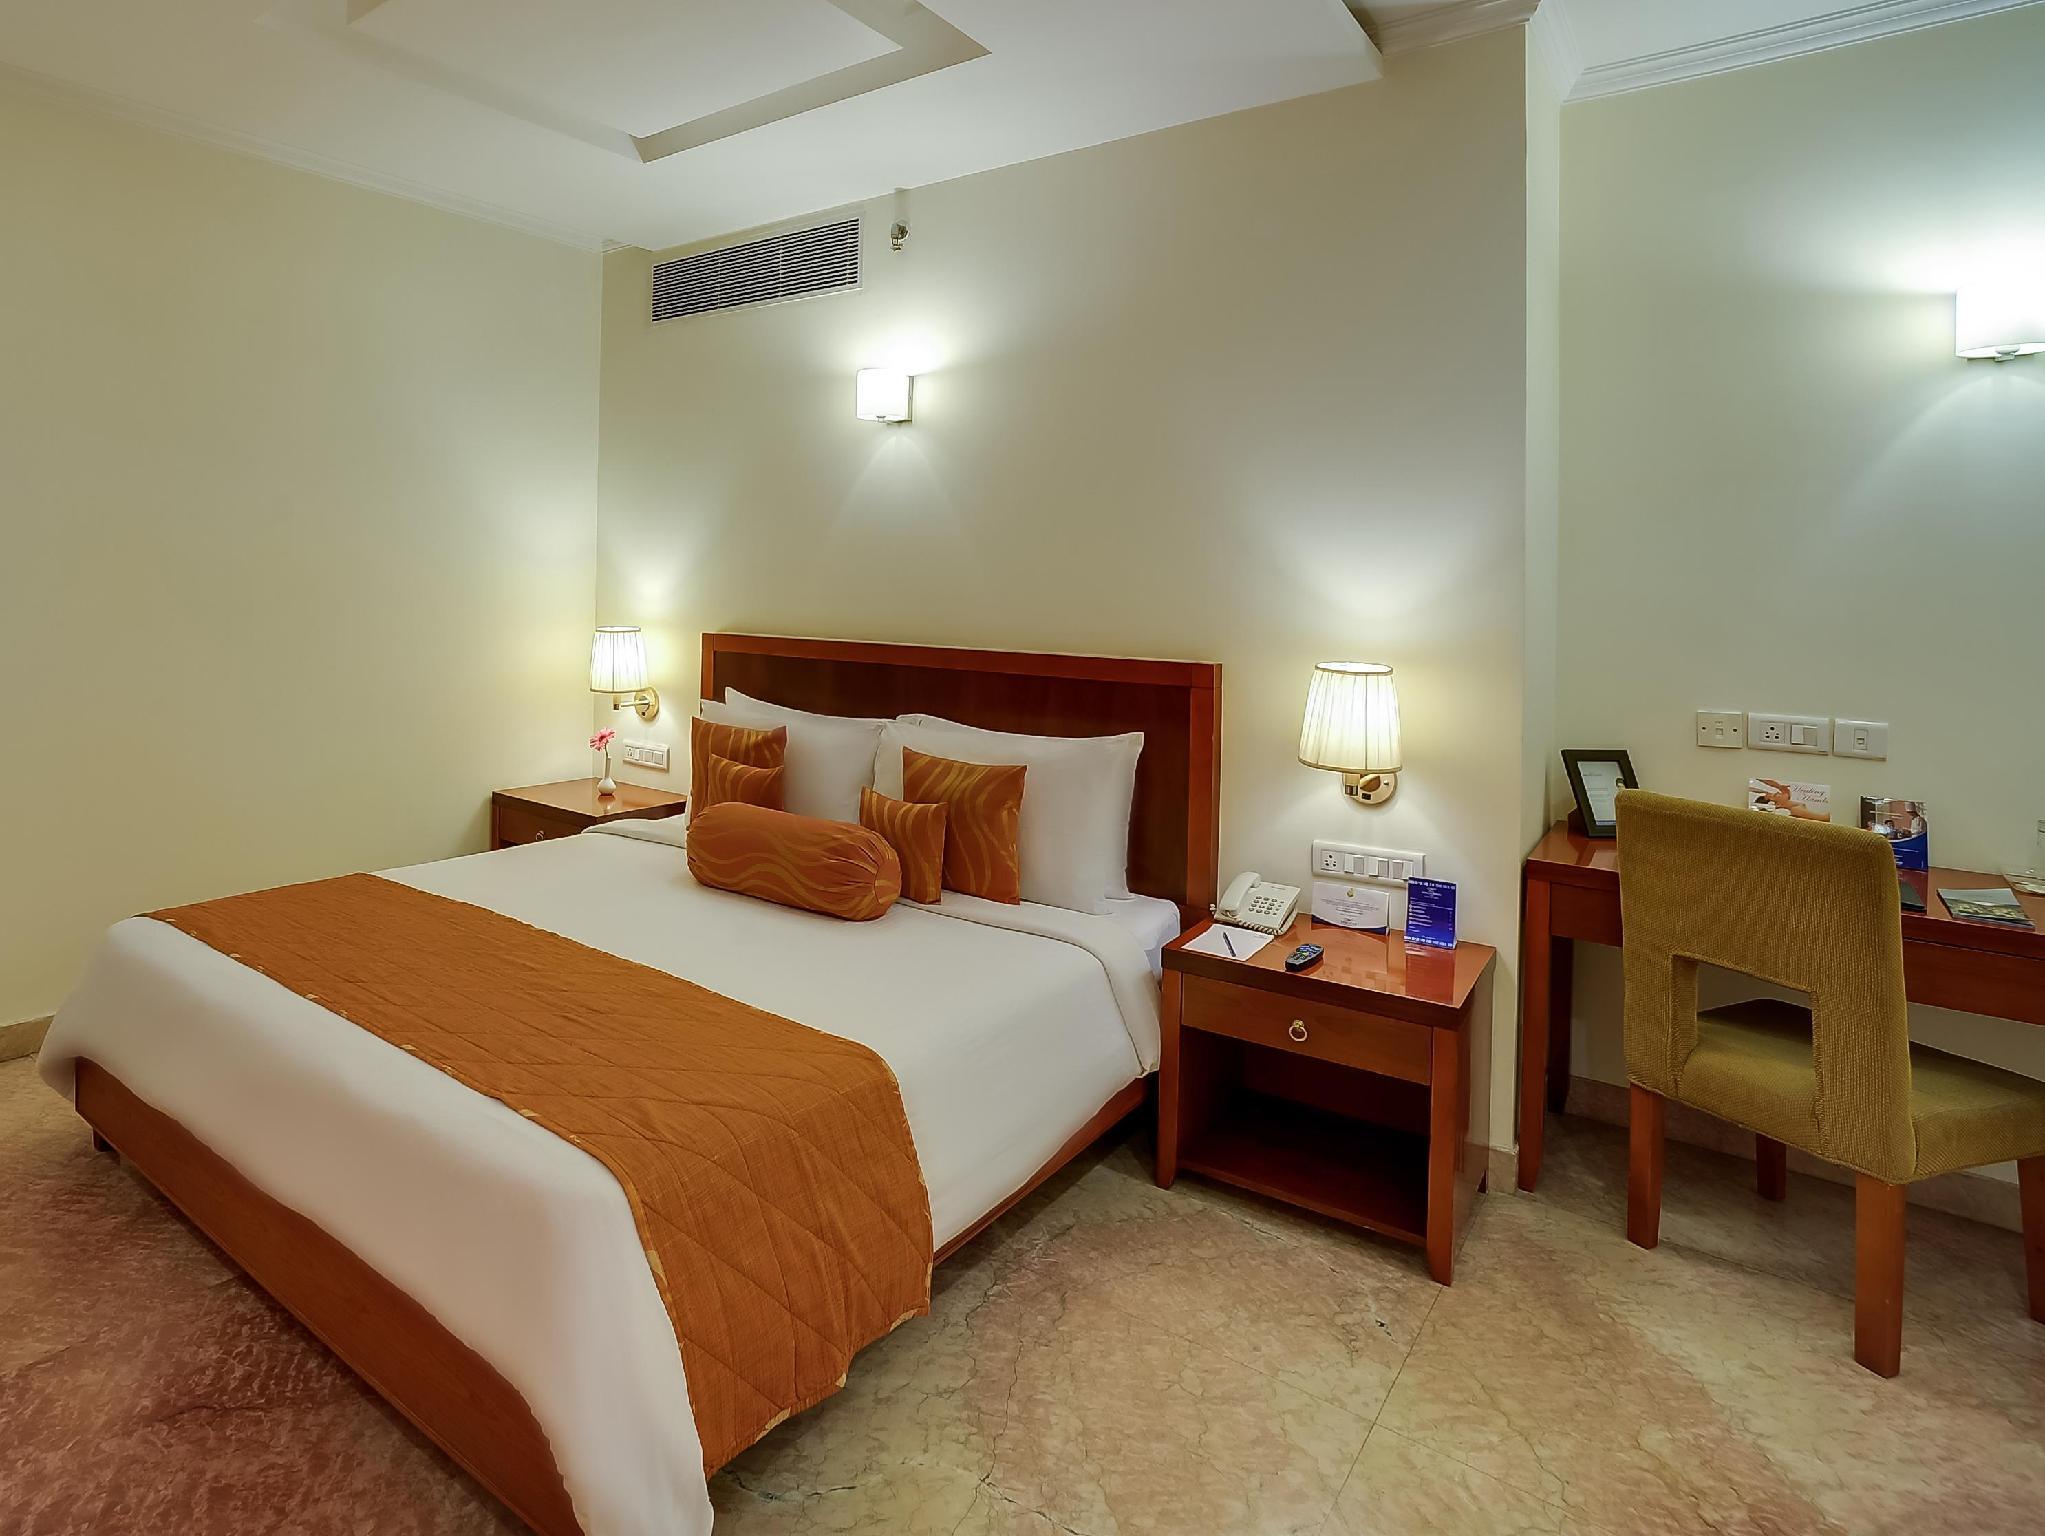 Hotel Royal Sarovar Portico Siliguri Hotel Royal Sarovar Portico Siliguri Reviews